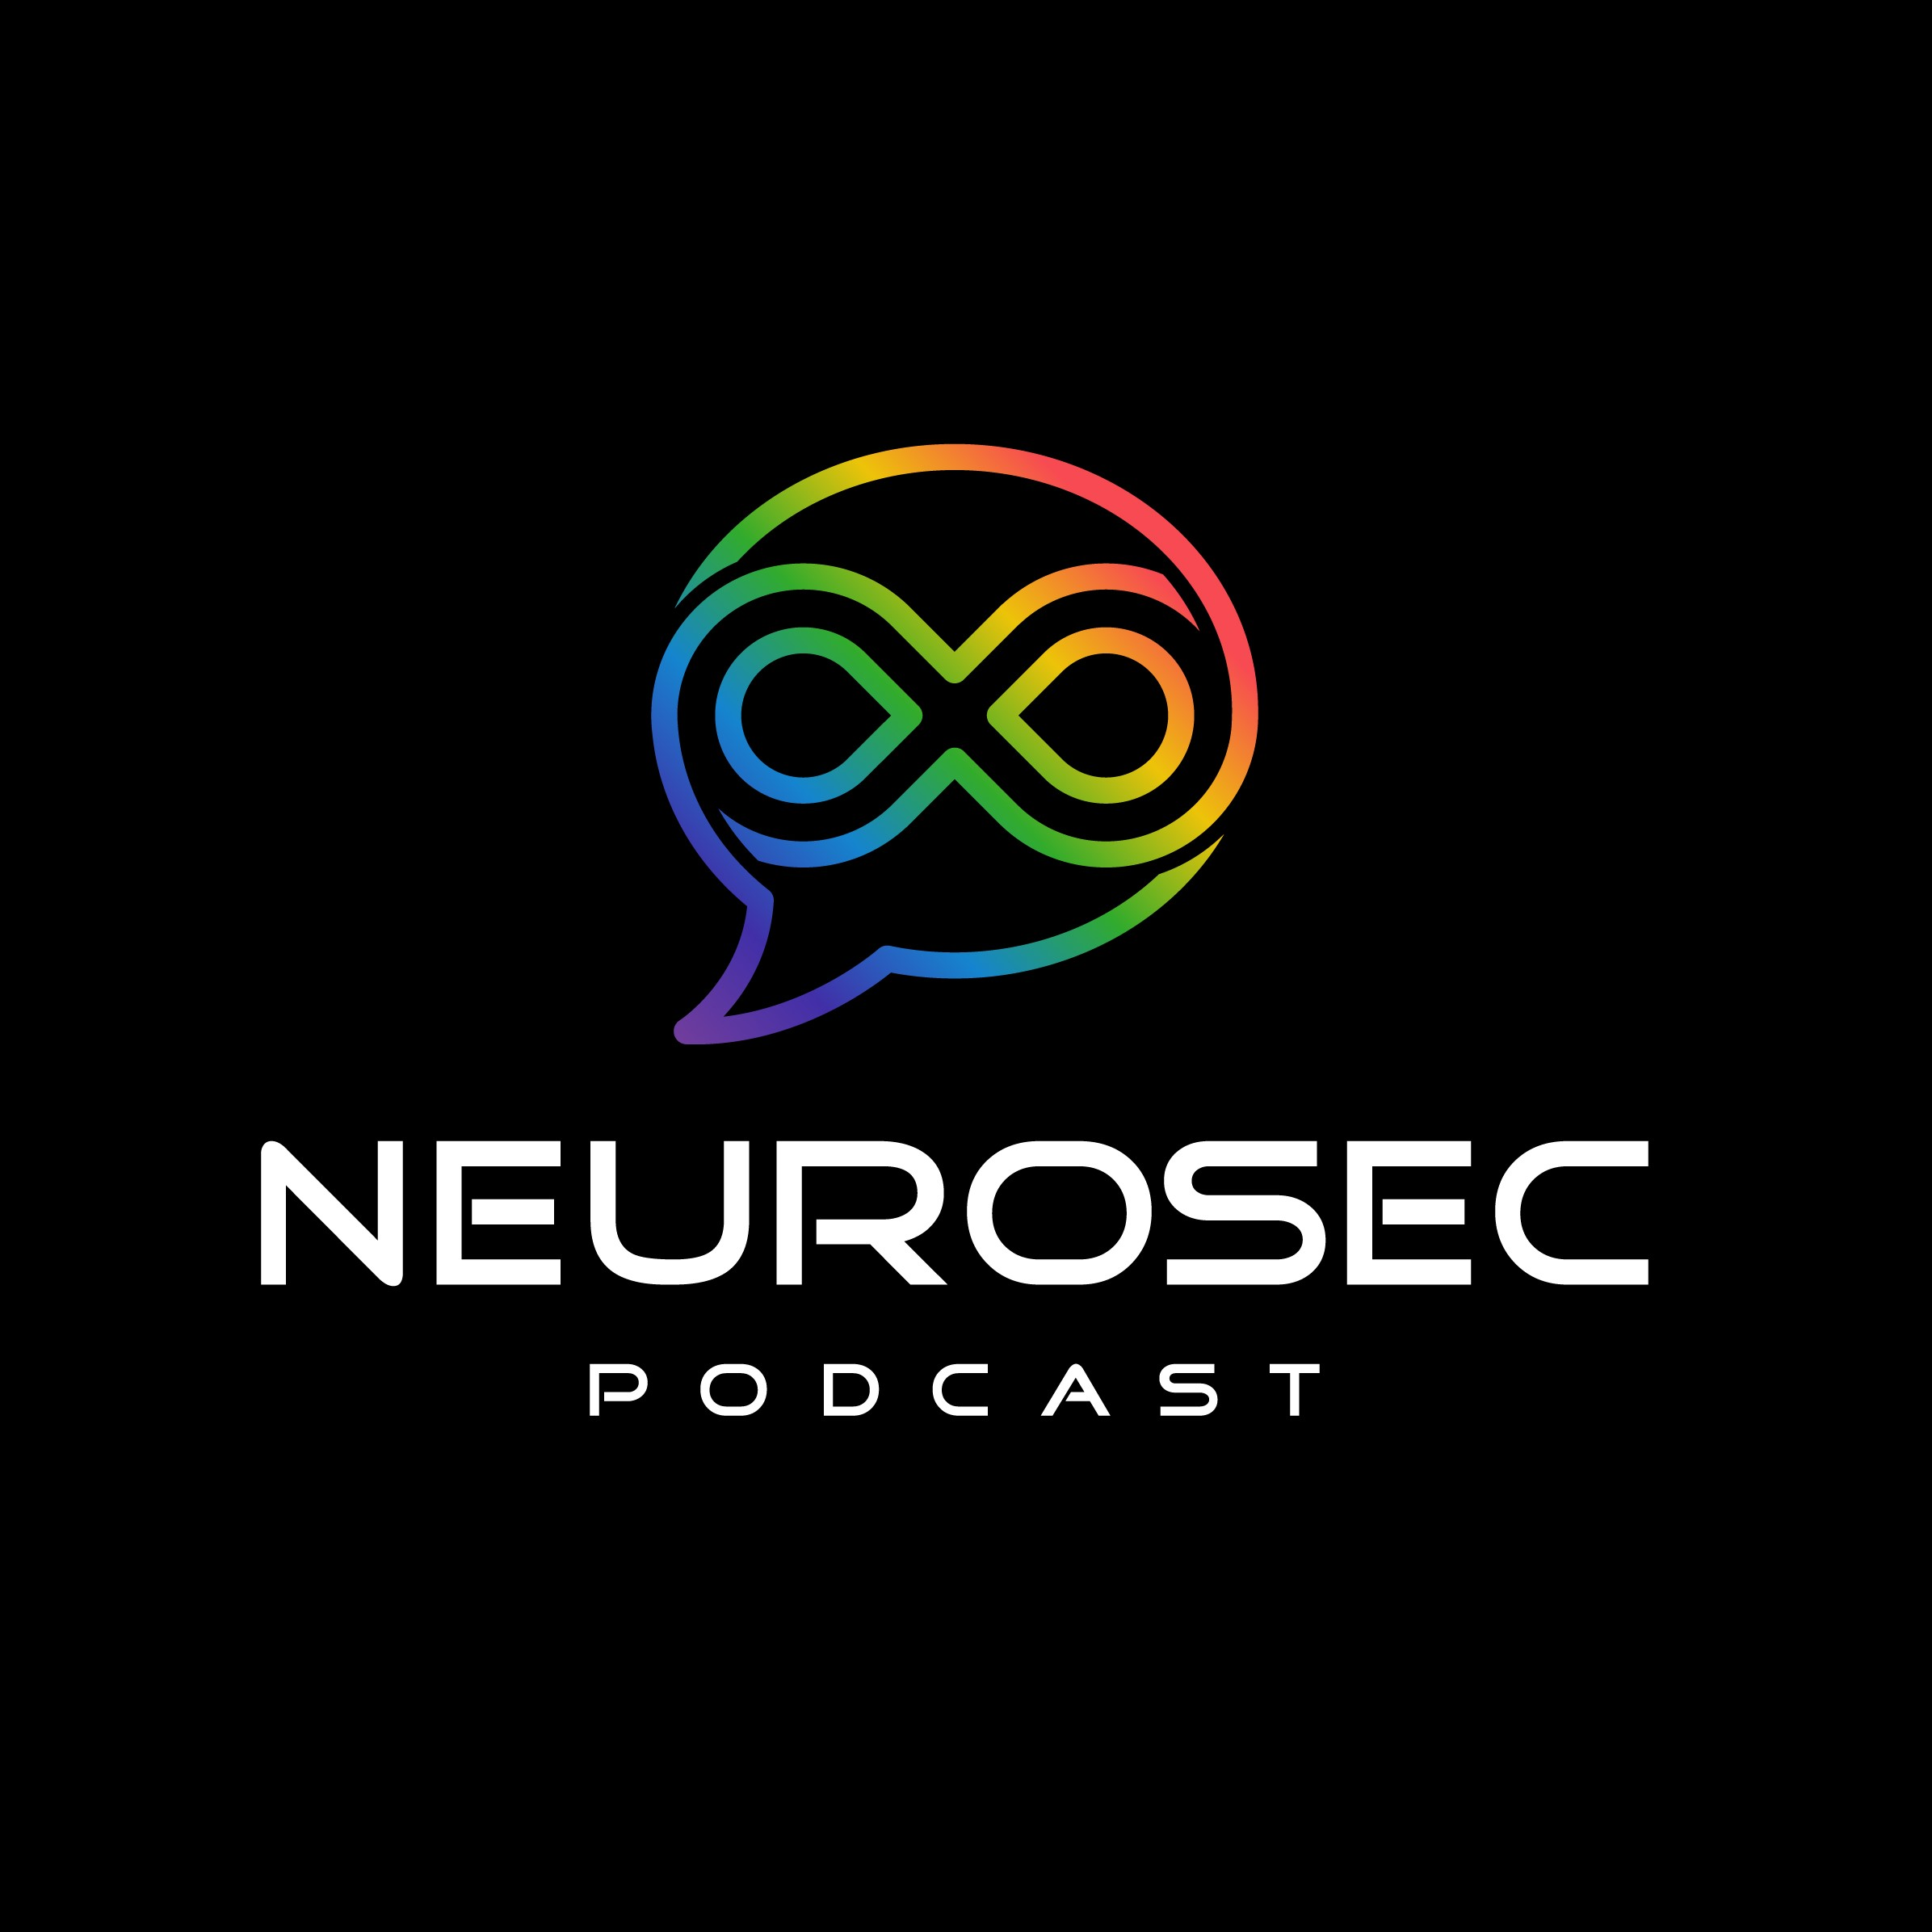 Show artwork for NeuroSec